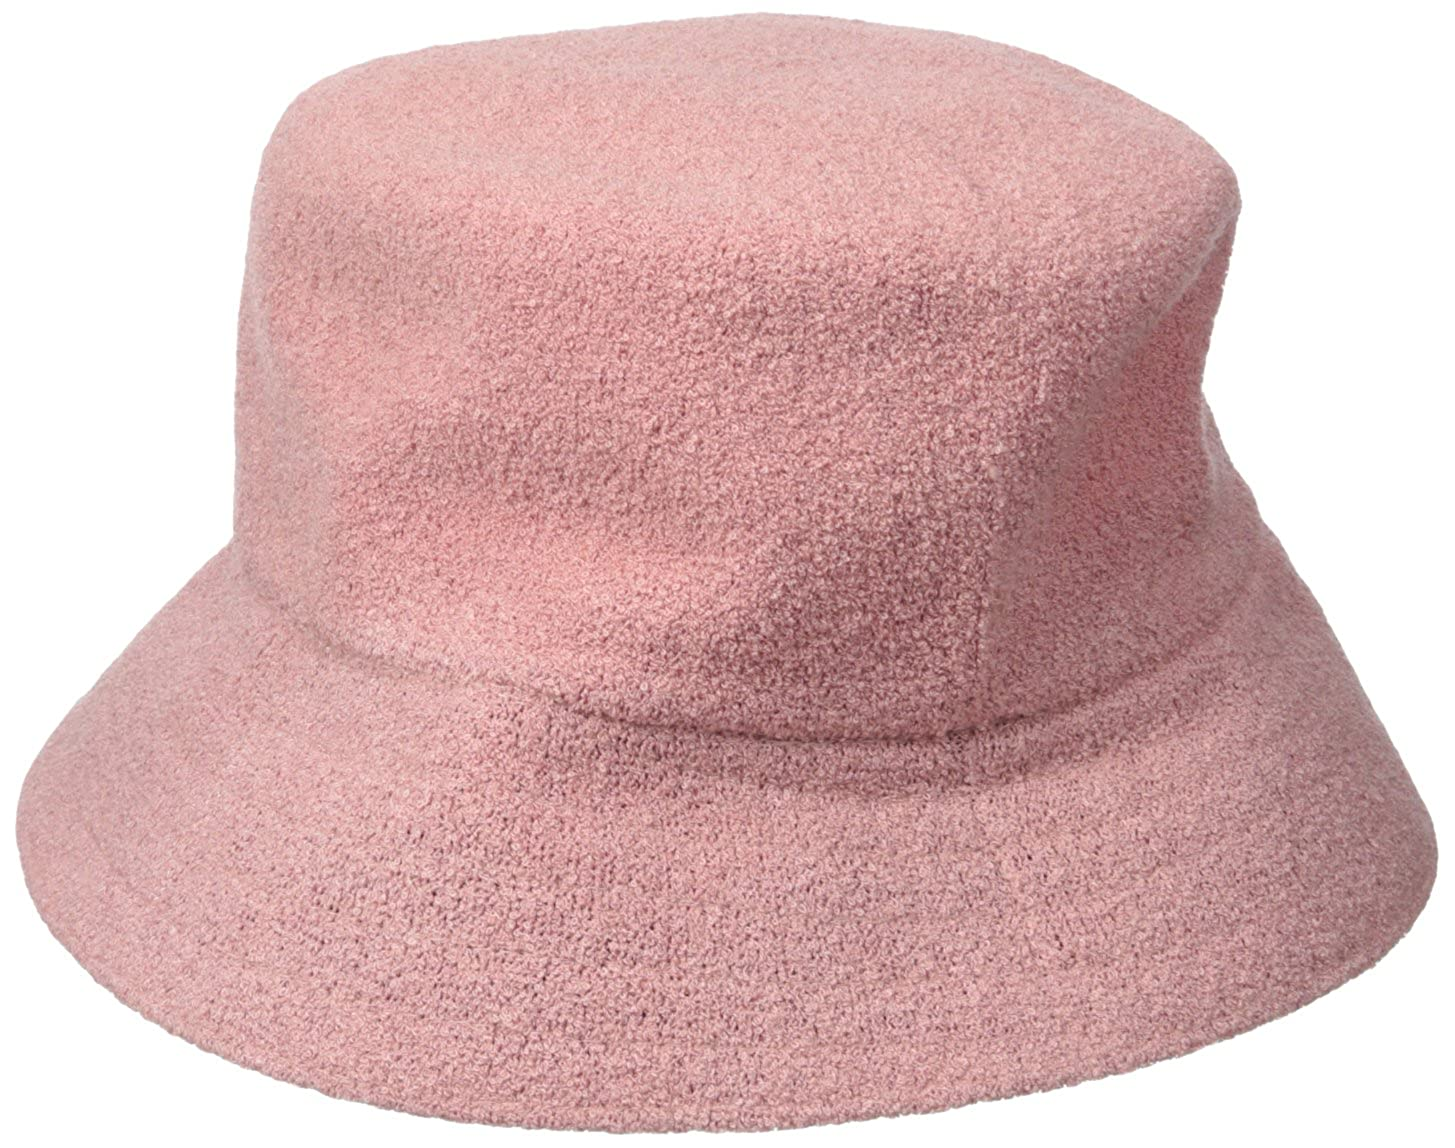 6298d7d62 Kangol Bermuda Bucket Hat, Pink (Quartz), Large: Amazon.co.uk: Clothing